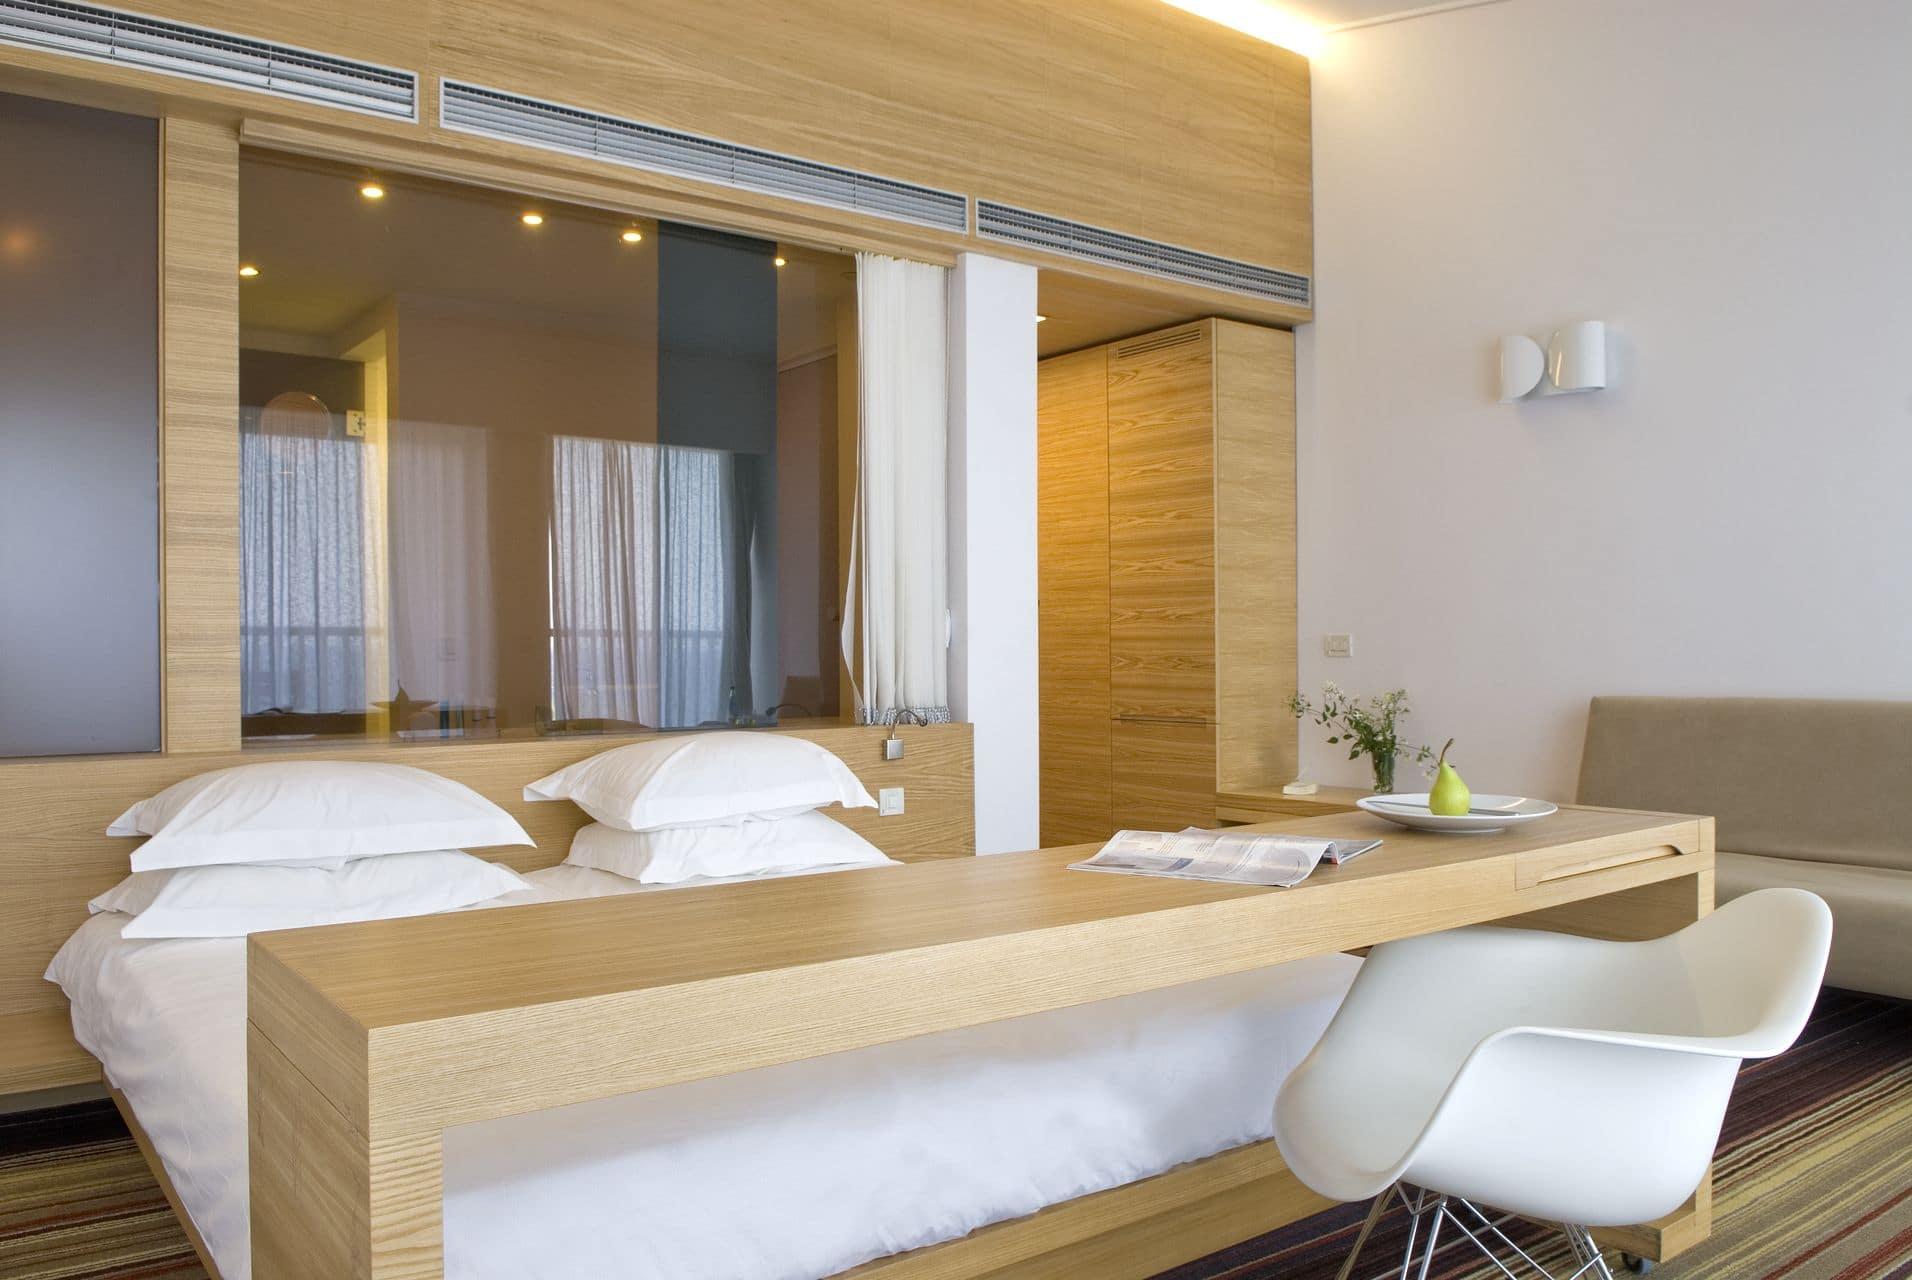 An in-room view of Doryssa Seaside's luxury seaview suites in Samos